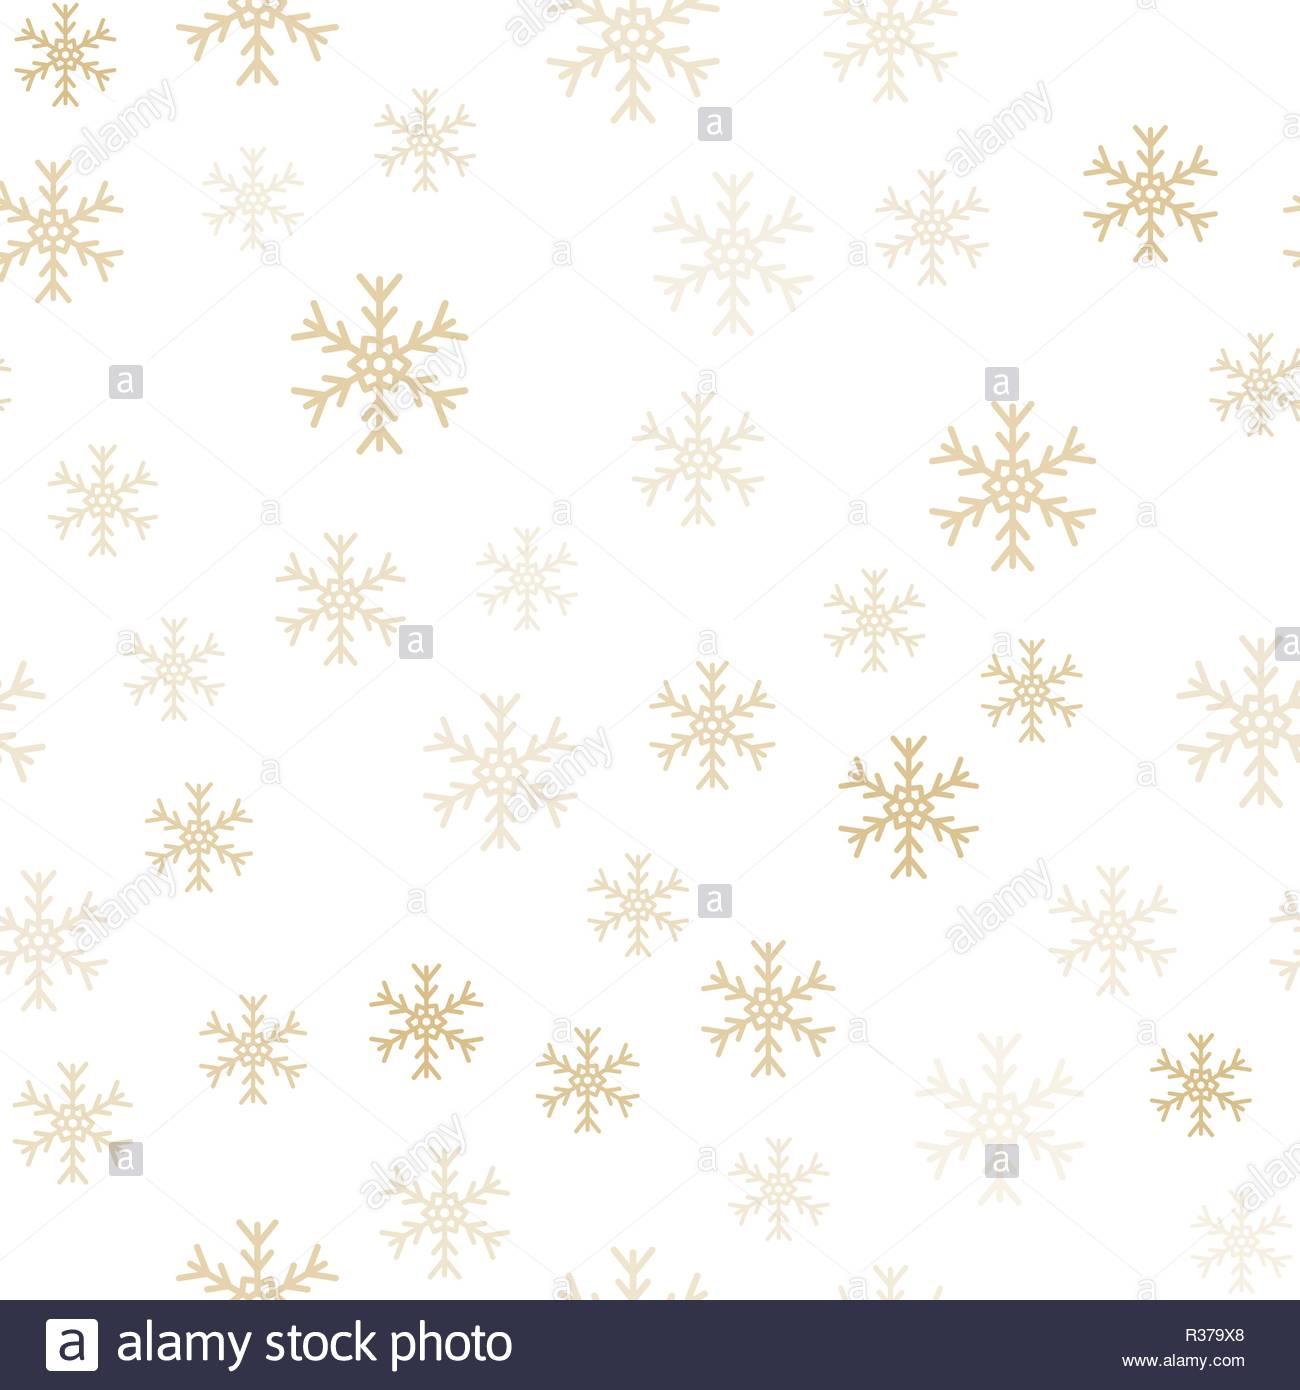 Snowflake pattern background cover creative design 100 percent 1300x1390